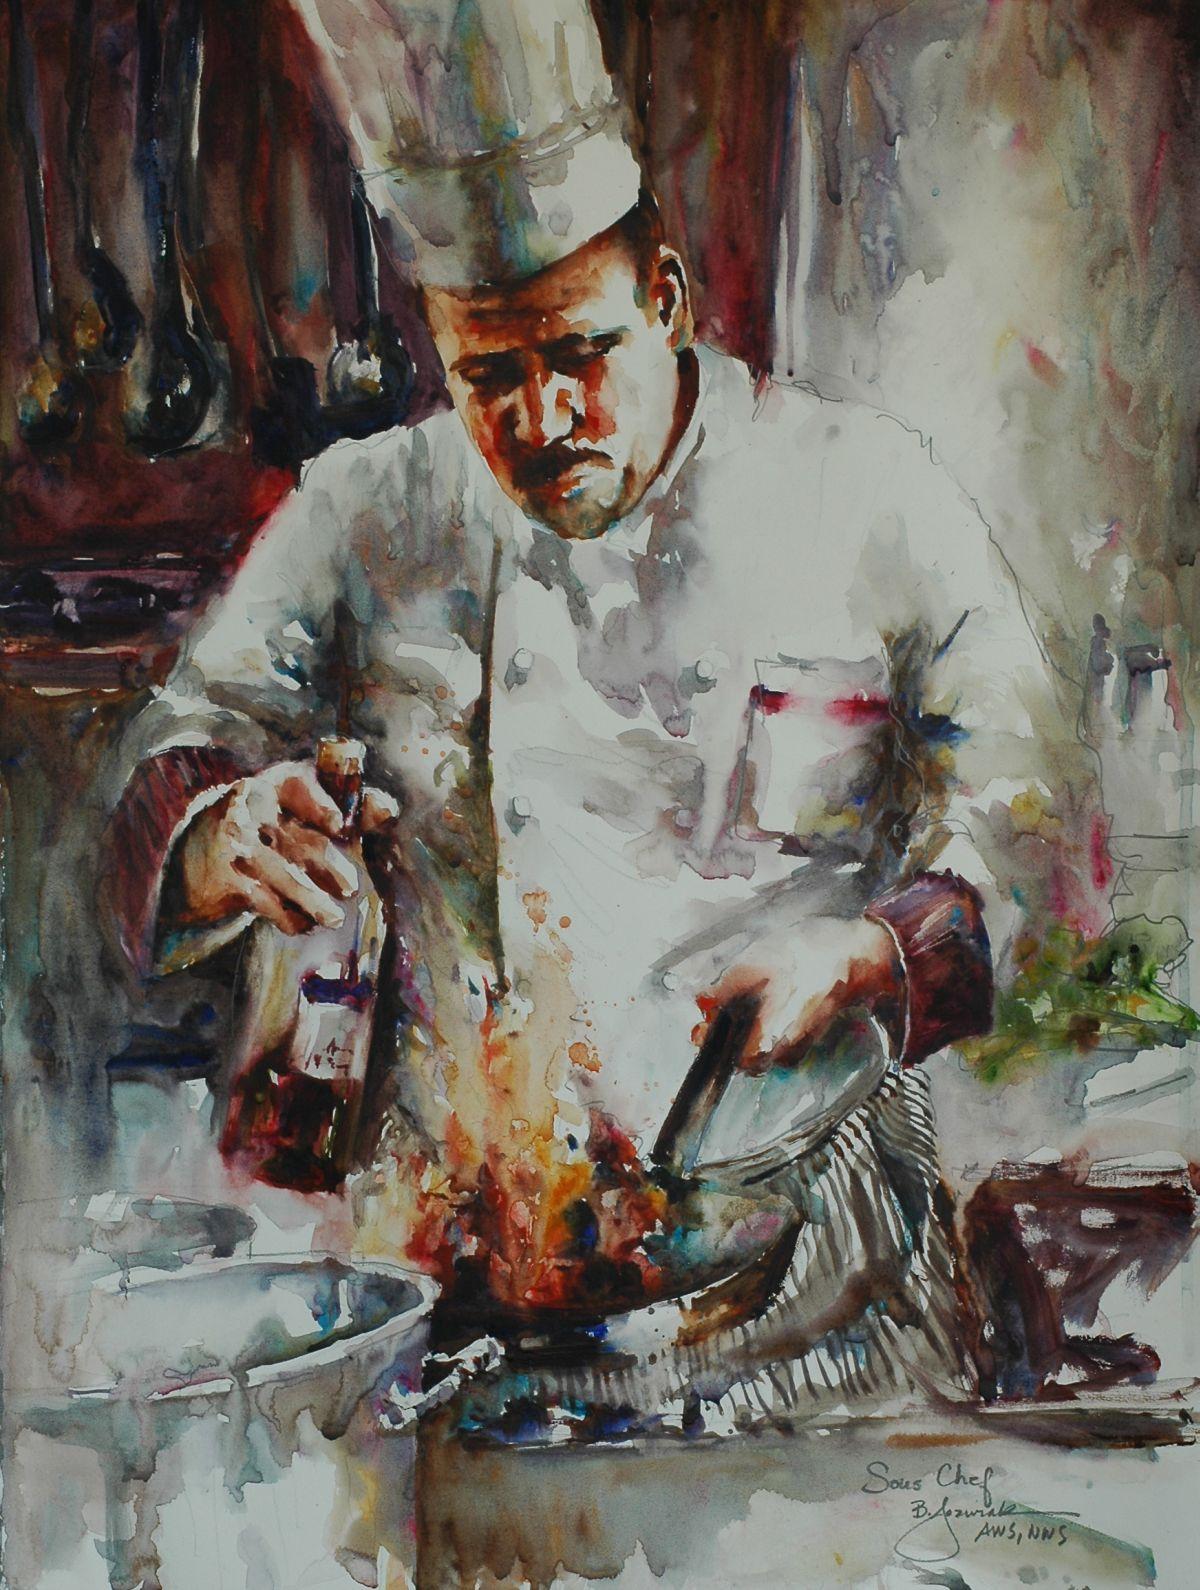 Chefs Bev Jozwiak